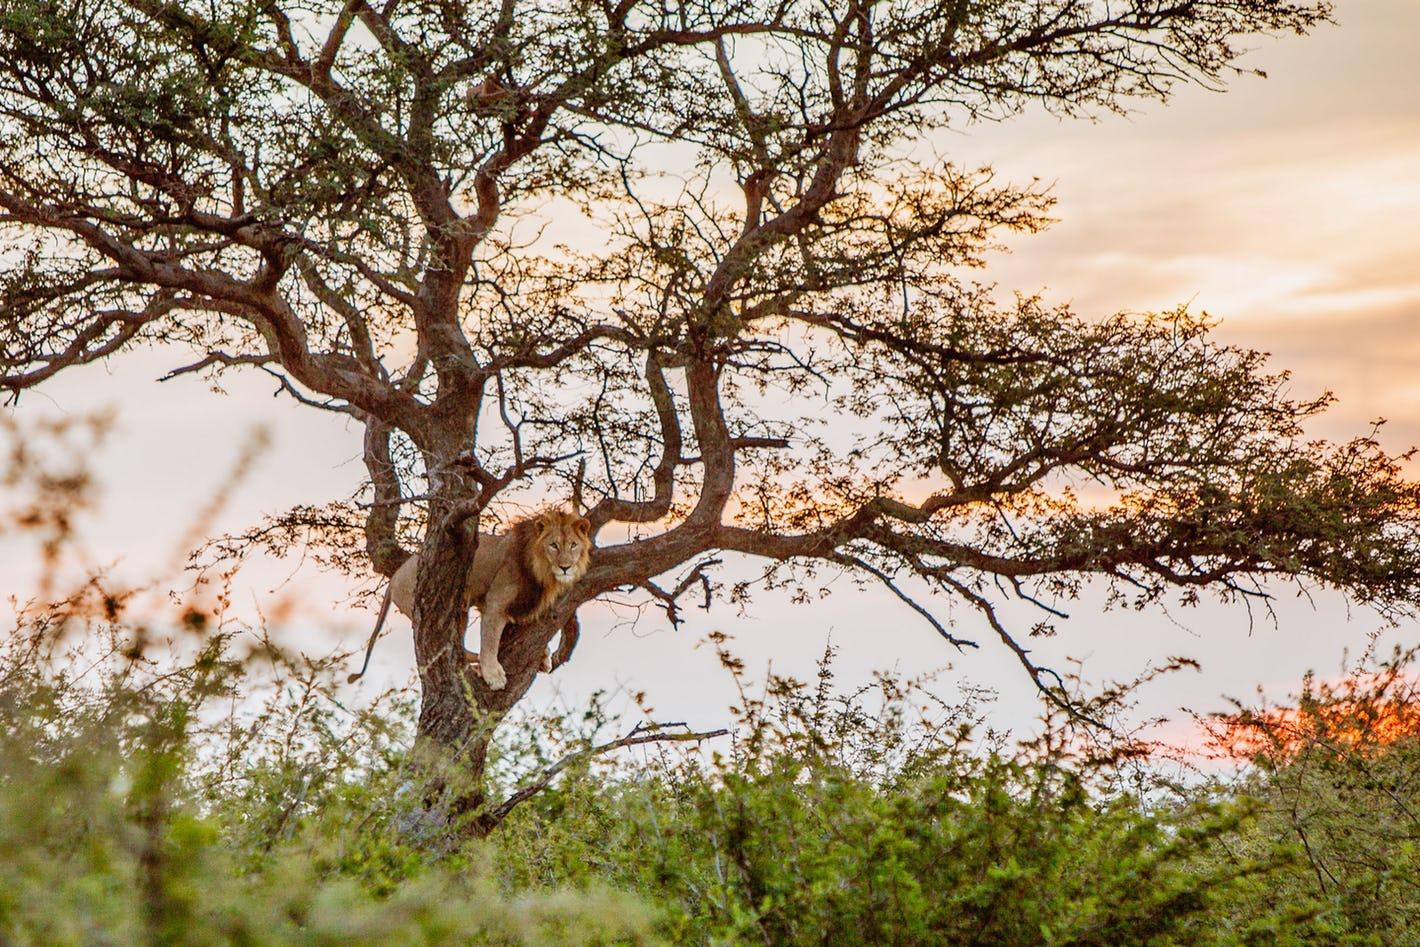 Plan an affordable South Africa safari